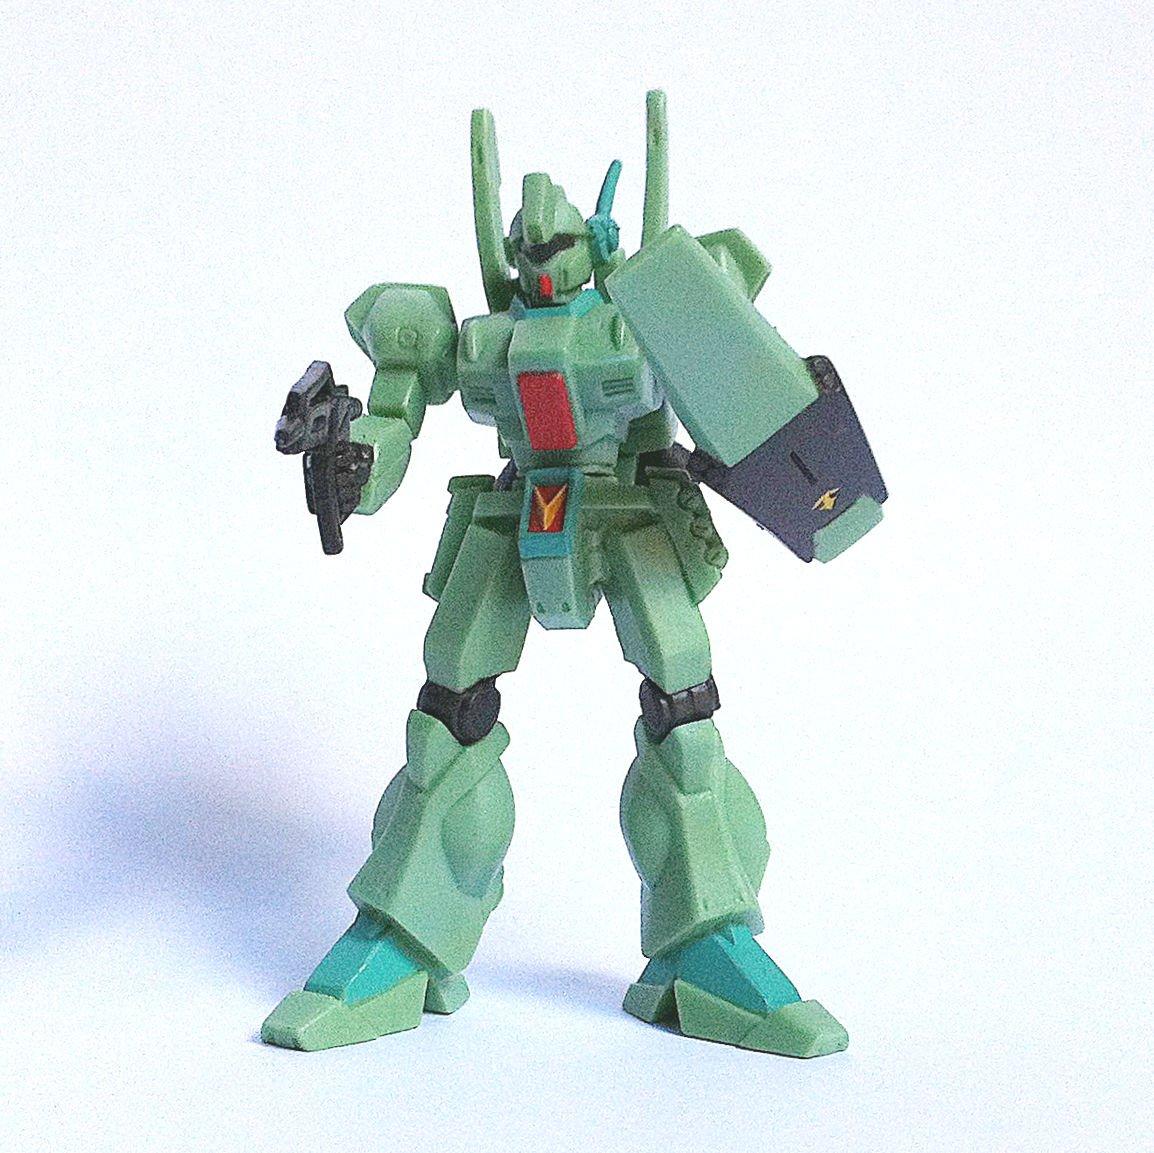 RGM-89 Jegan from HG Gundam MS Selection 24 by Bandai